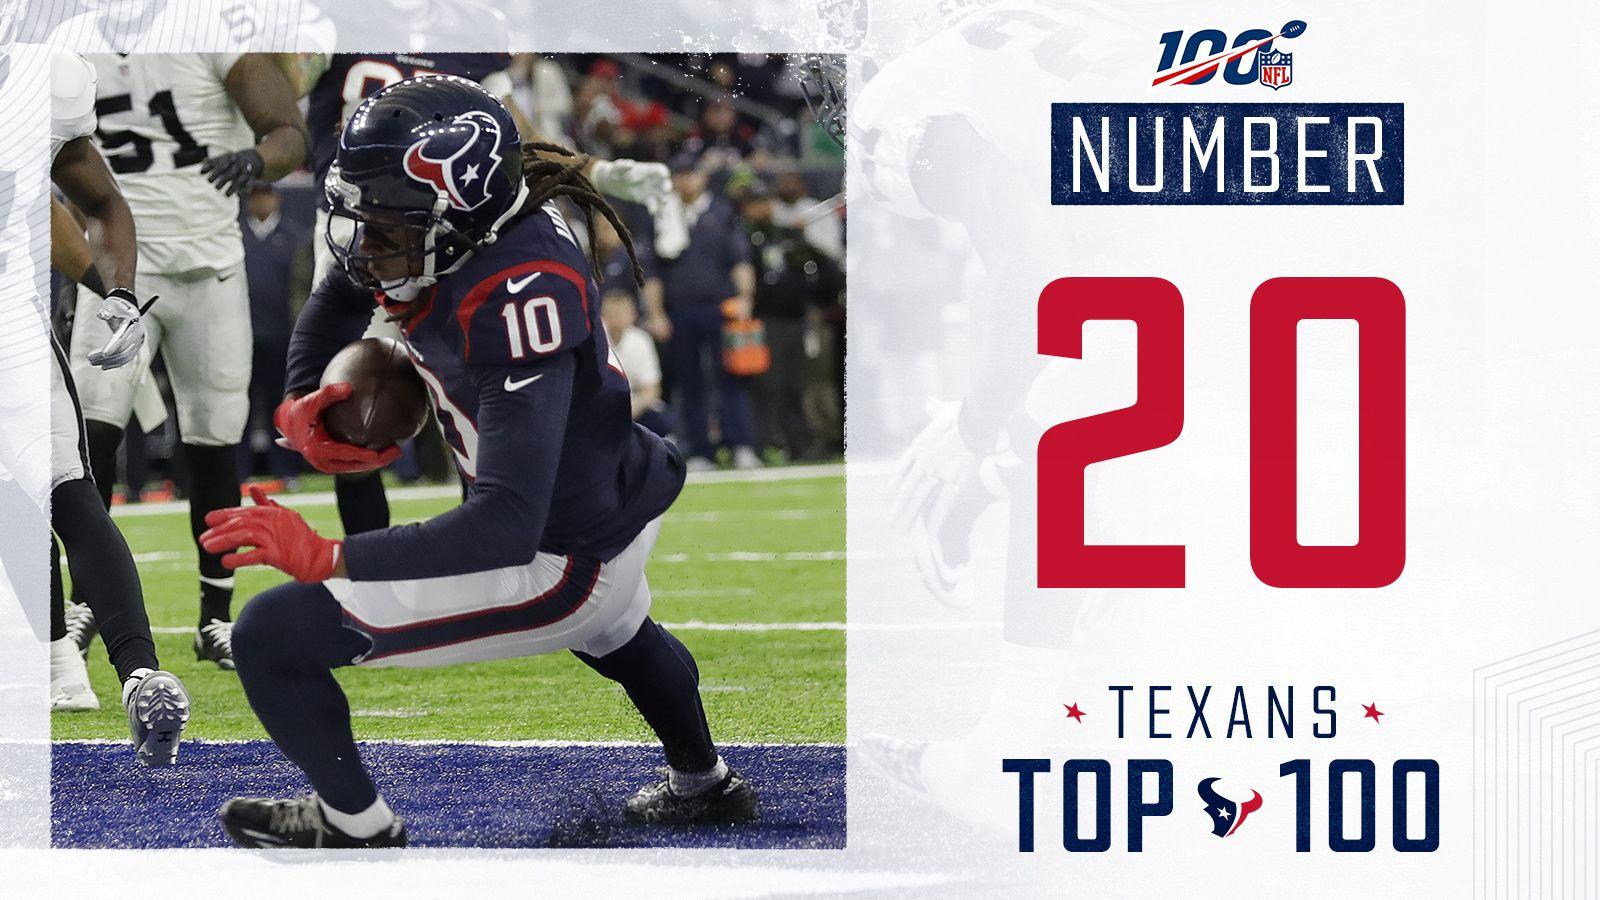 20_Texans beat Raiders in Playoffs - TWITTER